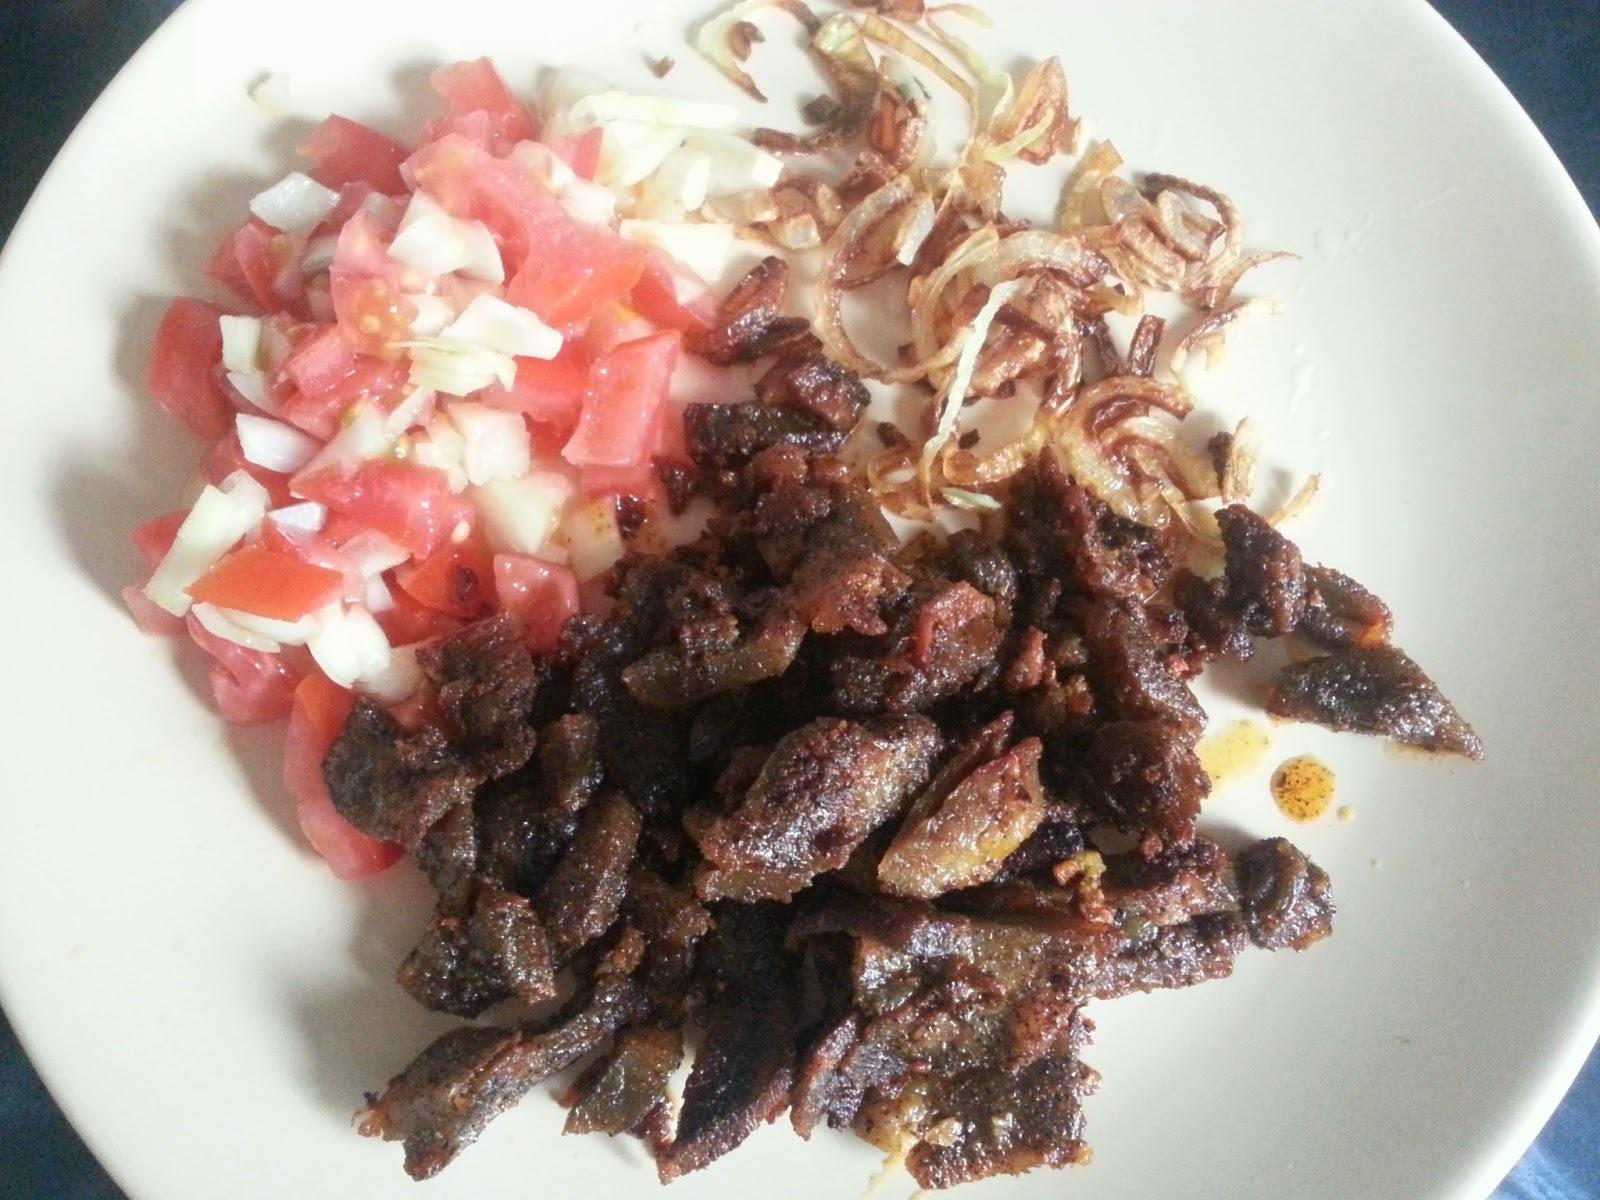 Gyros szalma hagymával, paradicsom salátával